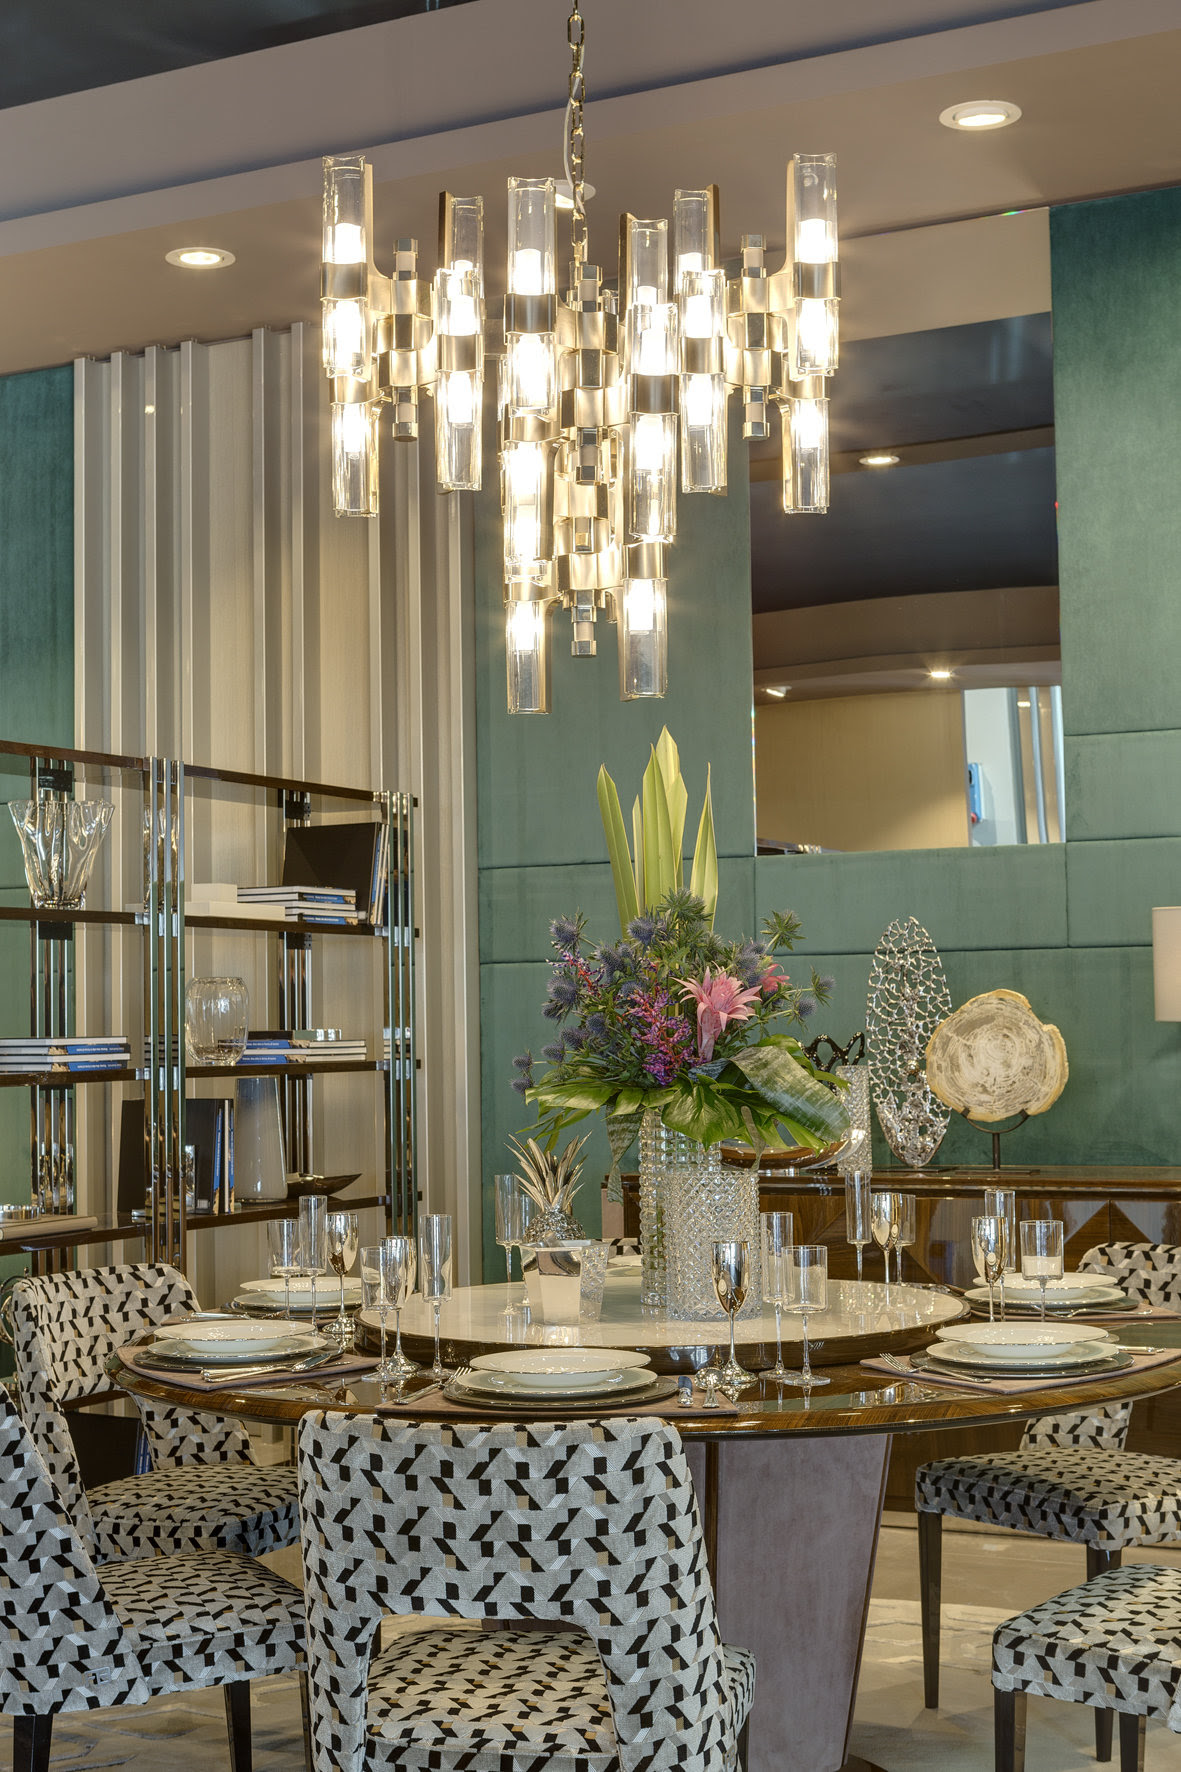 MSH at Salone - Officina Luce magnificent Eterea chandelier - Masha Shapiro Agency UK.jpg